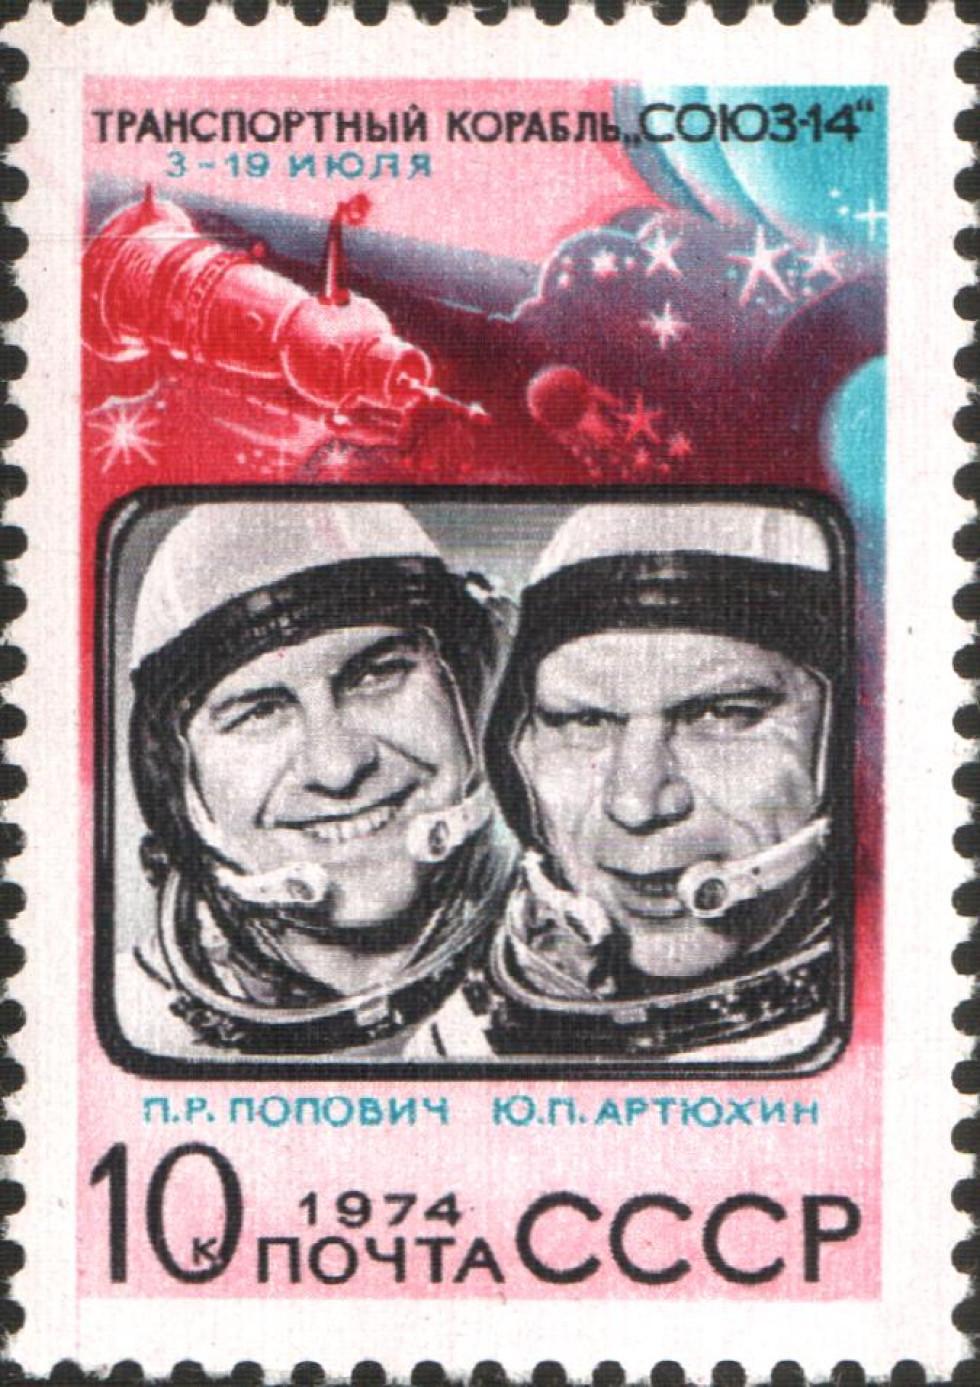 Поштова марка з героями космосу